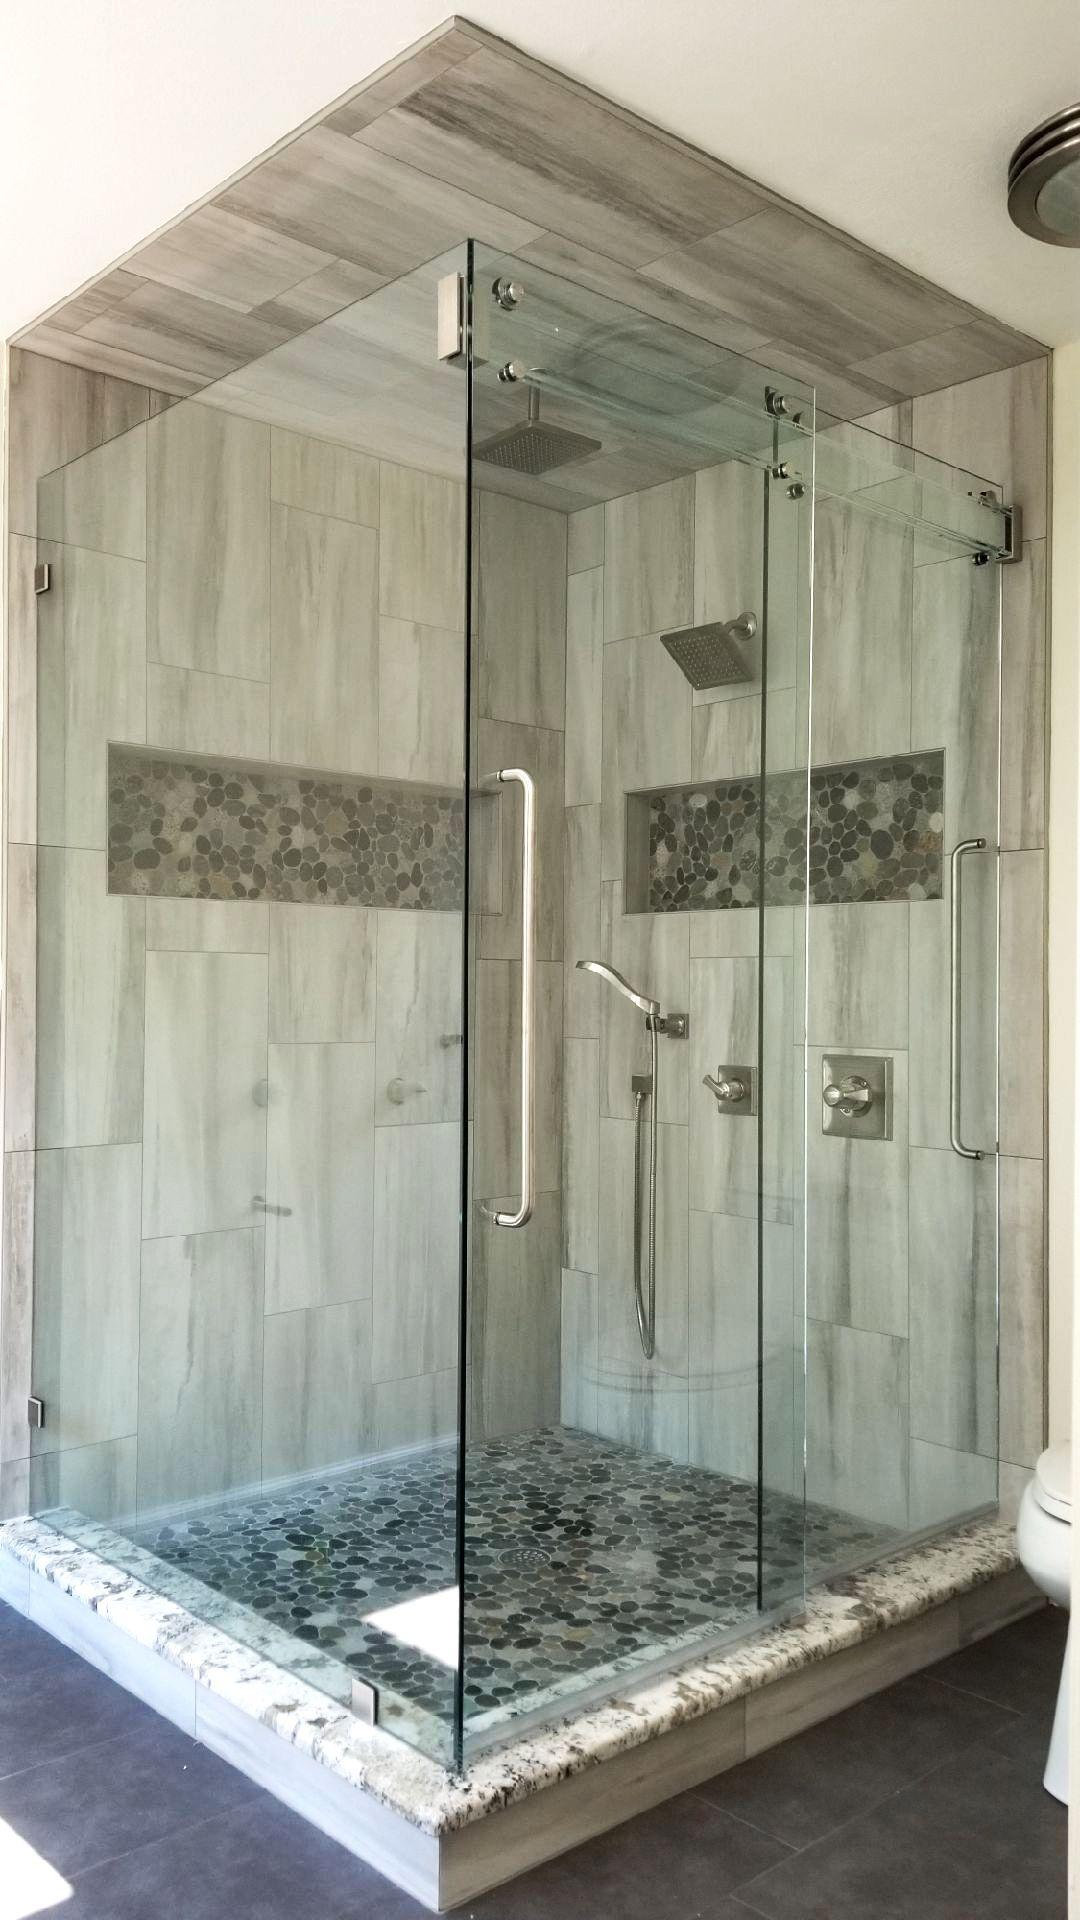 Barn Door Style Shower Enclosure All Glass Header Design